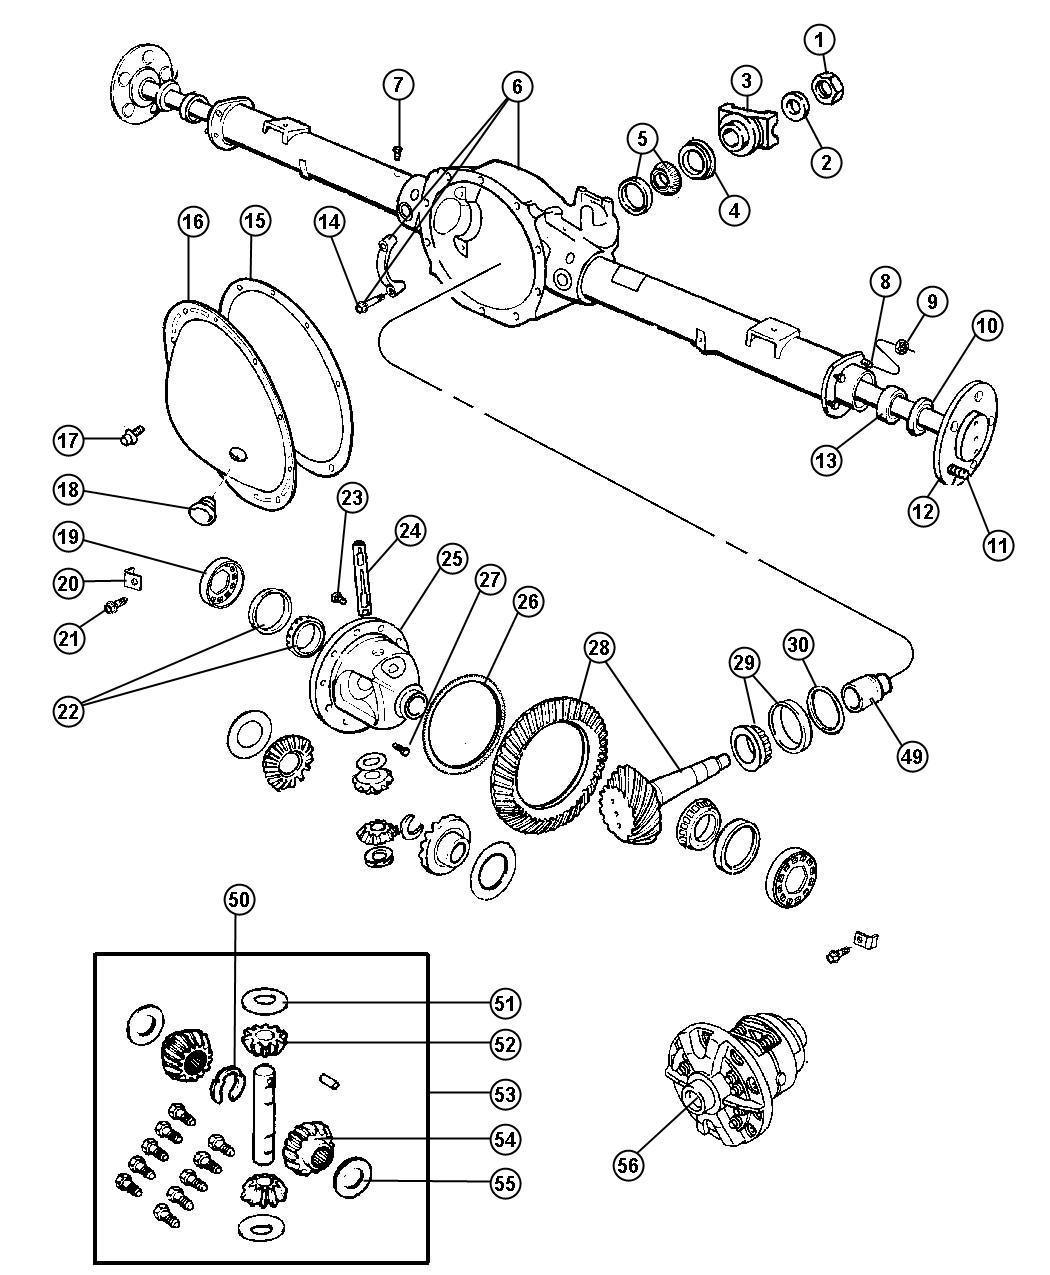 2005 Chevrolet Malibu Classic Fuse Diagram